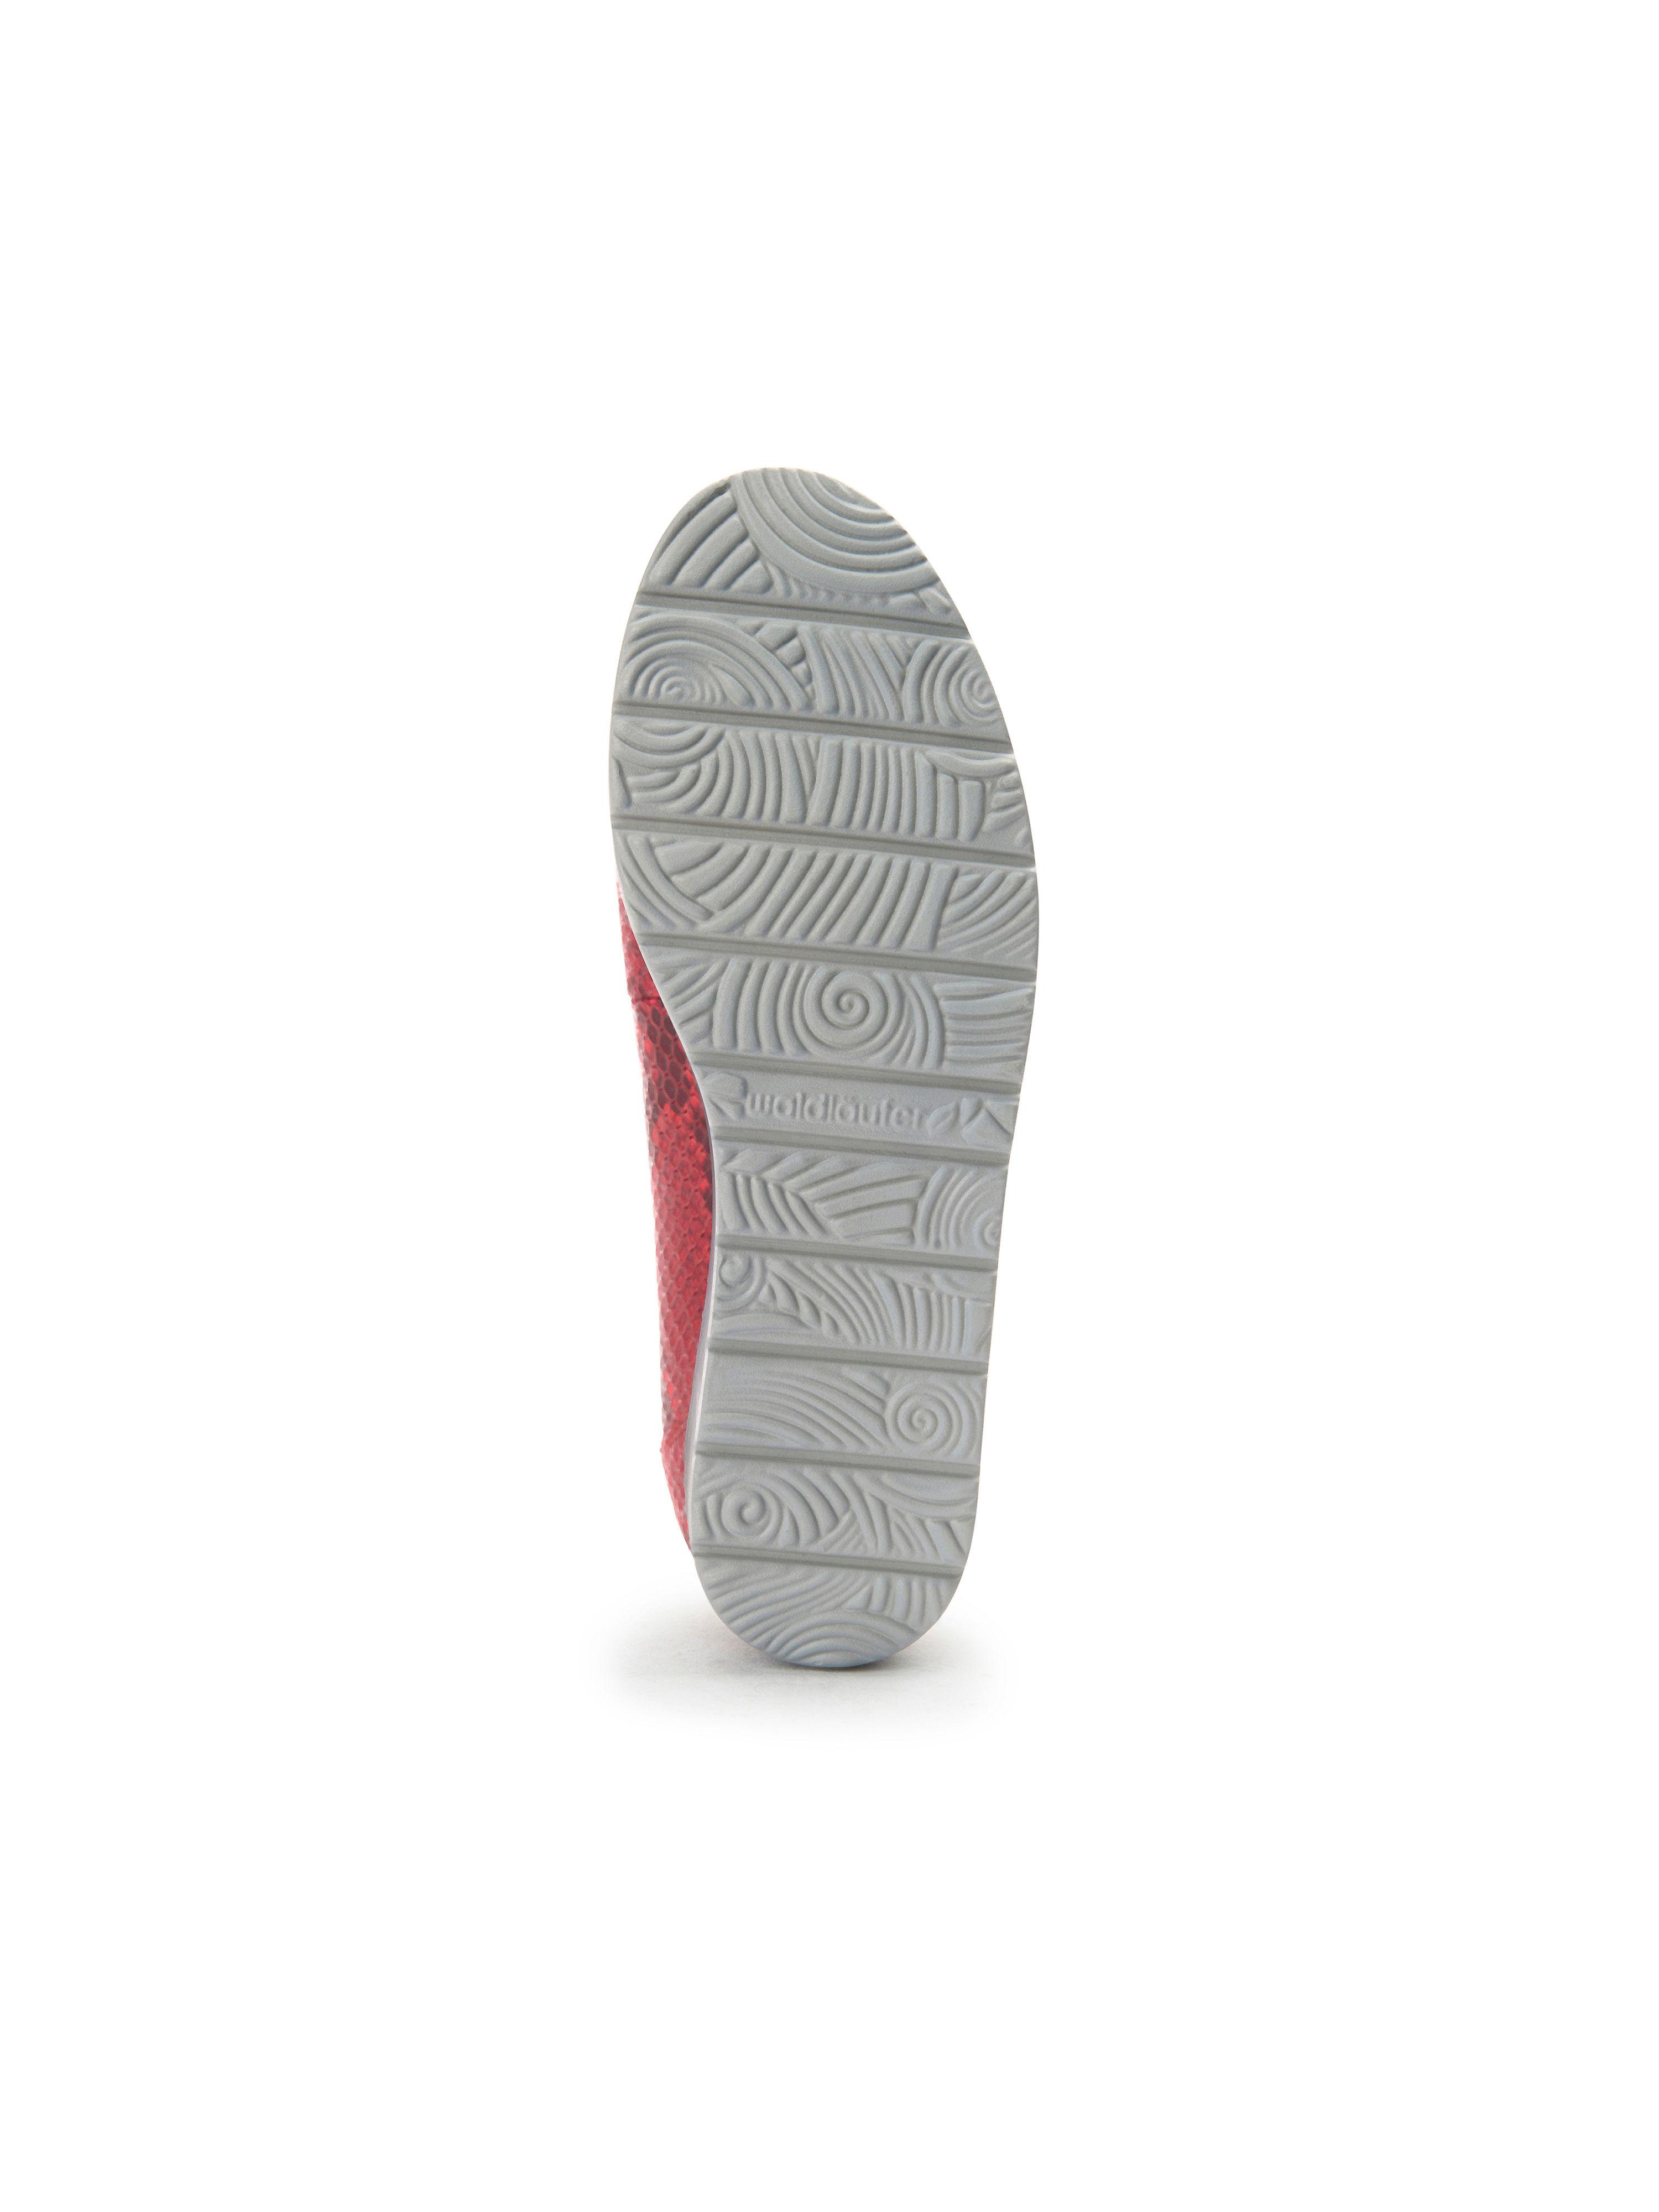 Waldläufer Rot-Metallic - Ballerina Hara aus 100% Leder - Rot-Metallic Waldläufer Gute Qualität beliebte Schuhe ec8c26